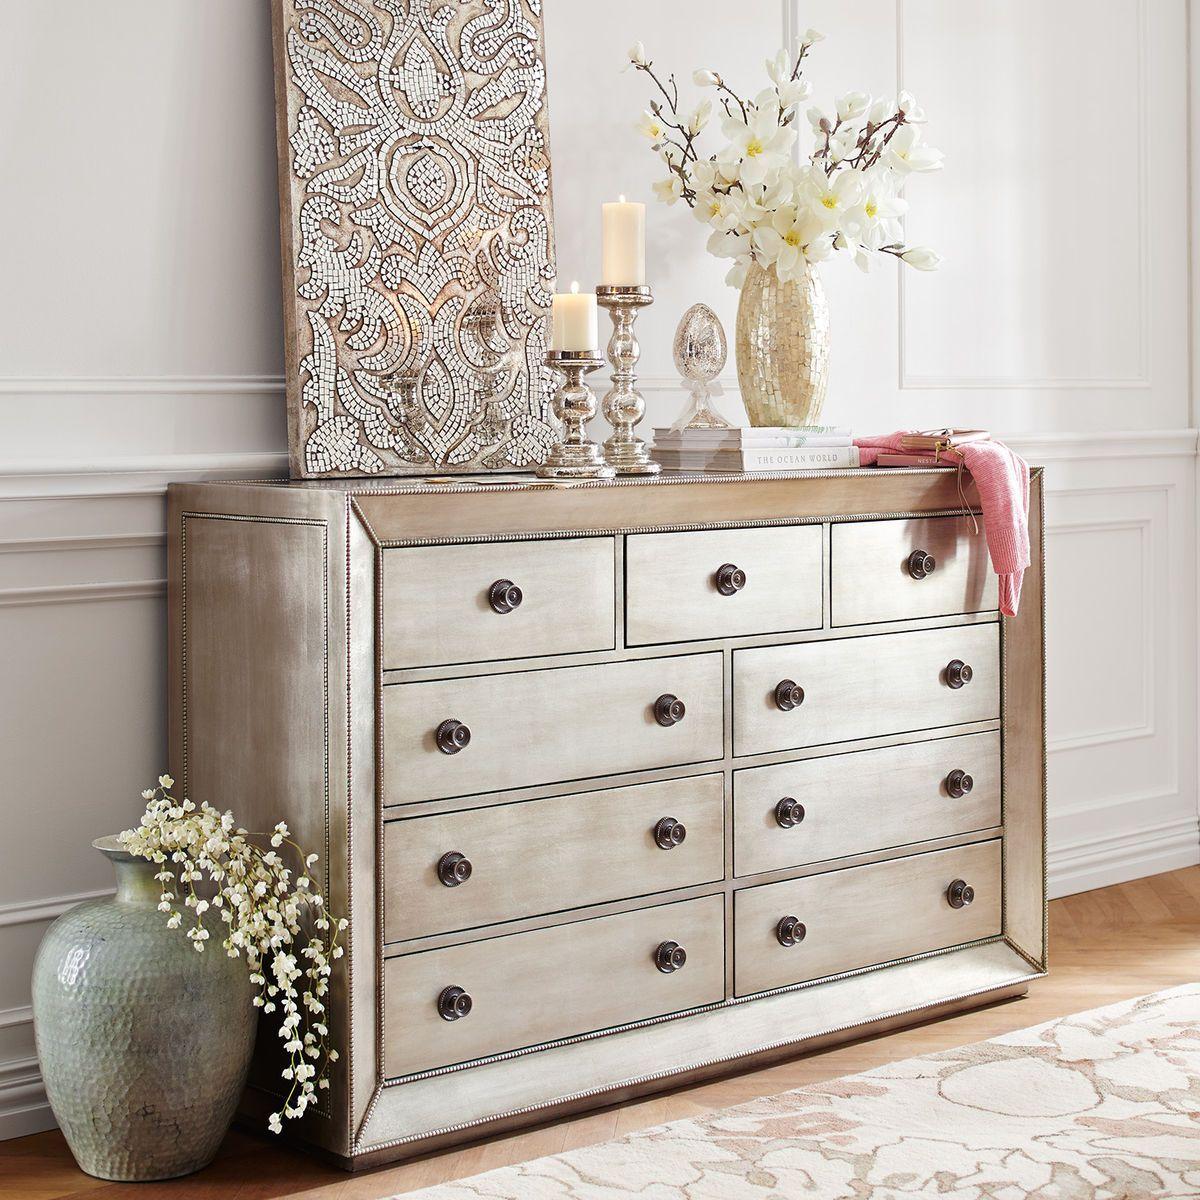 Pier One Baby Furniture: Celine Champagne Dresser In 2019